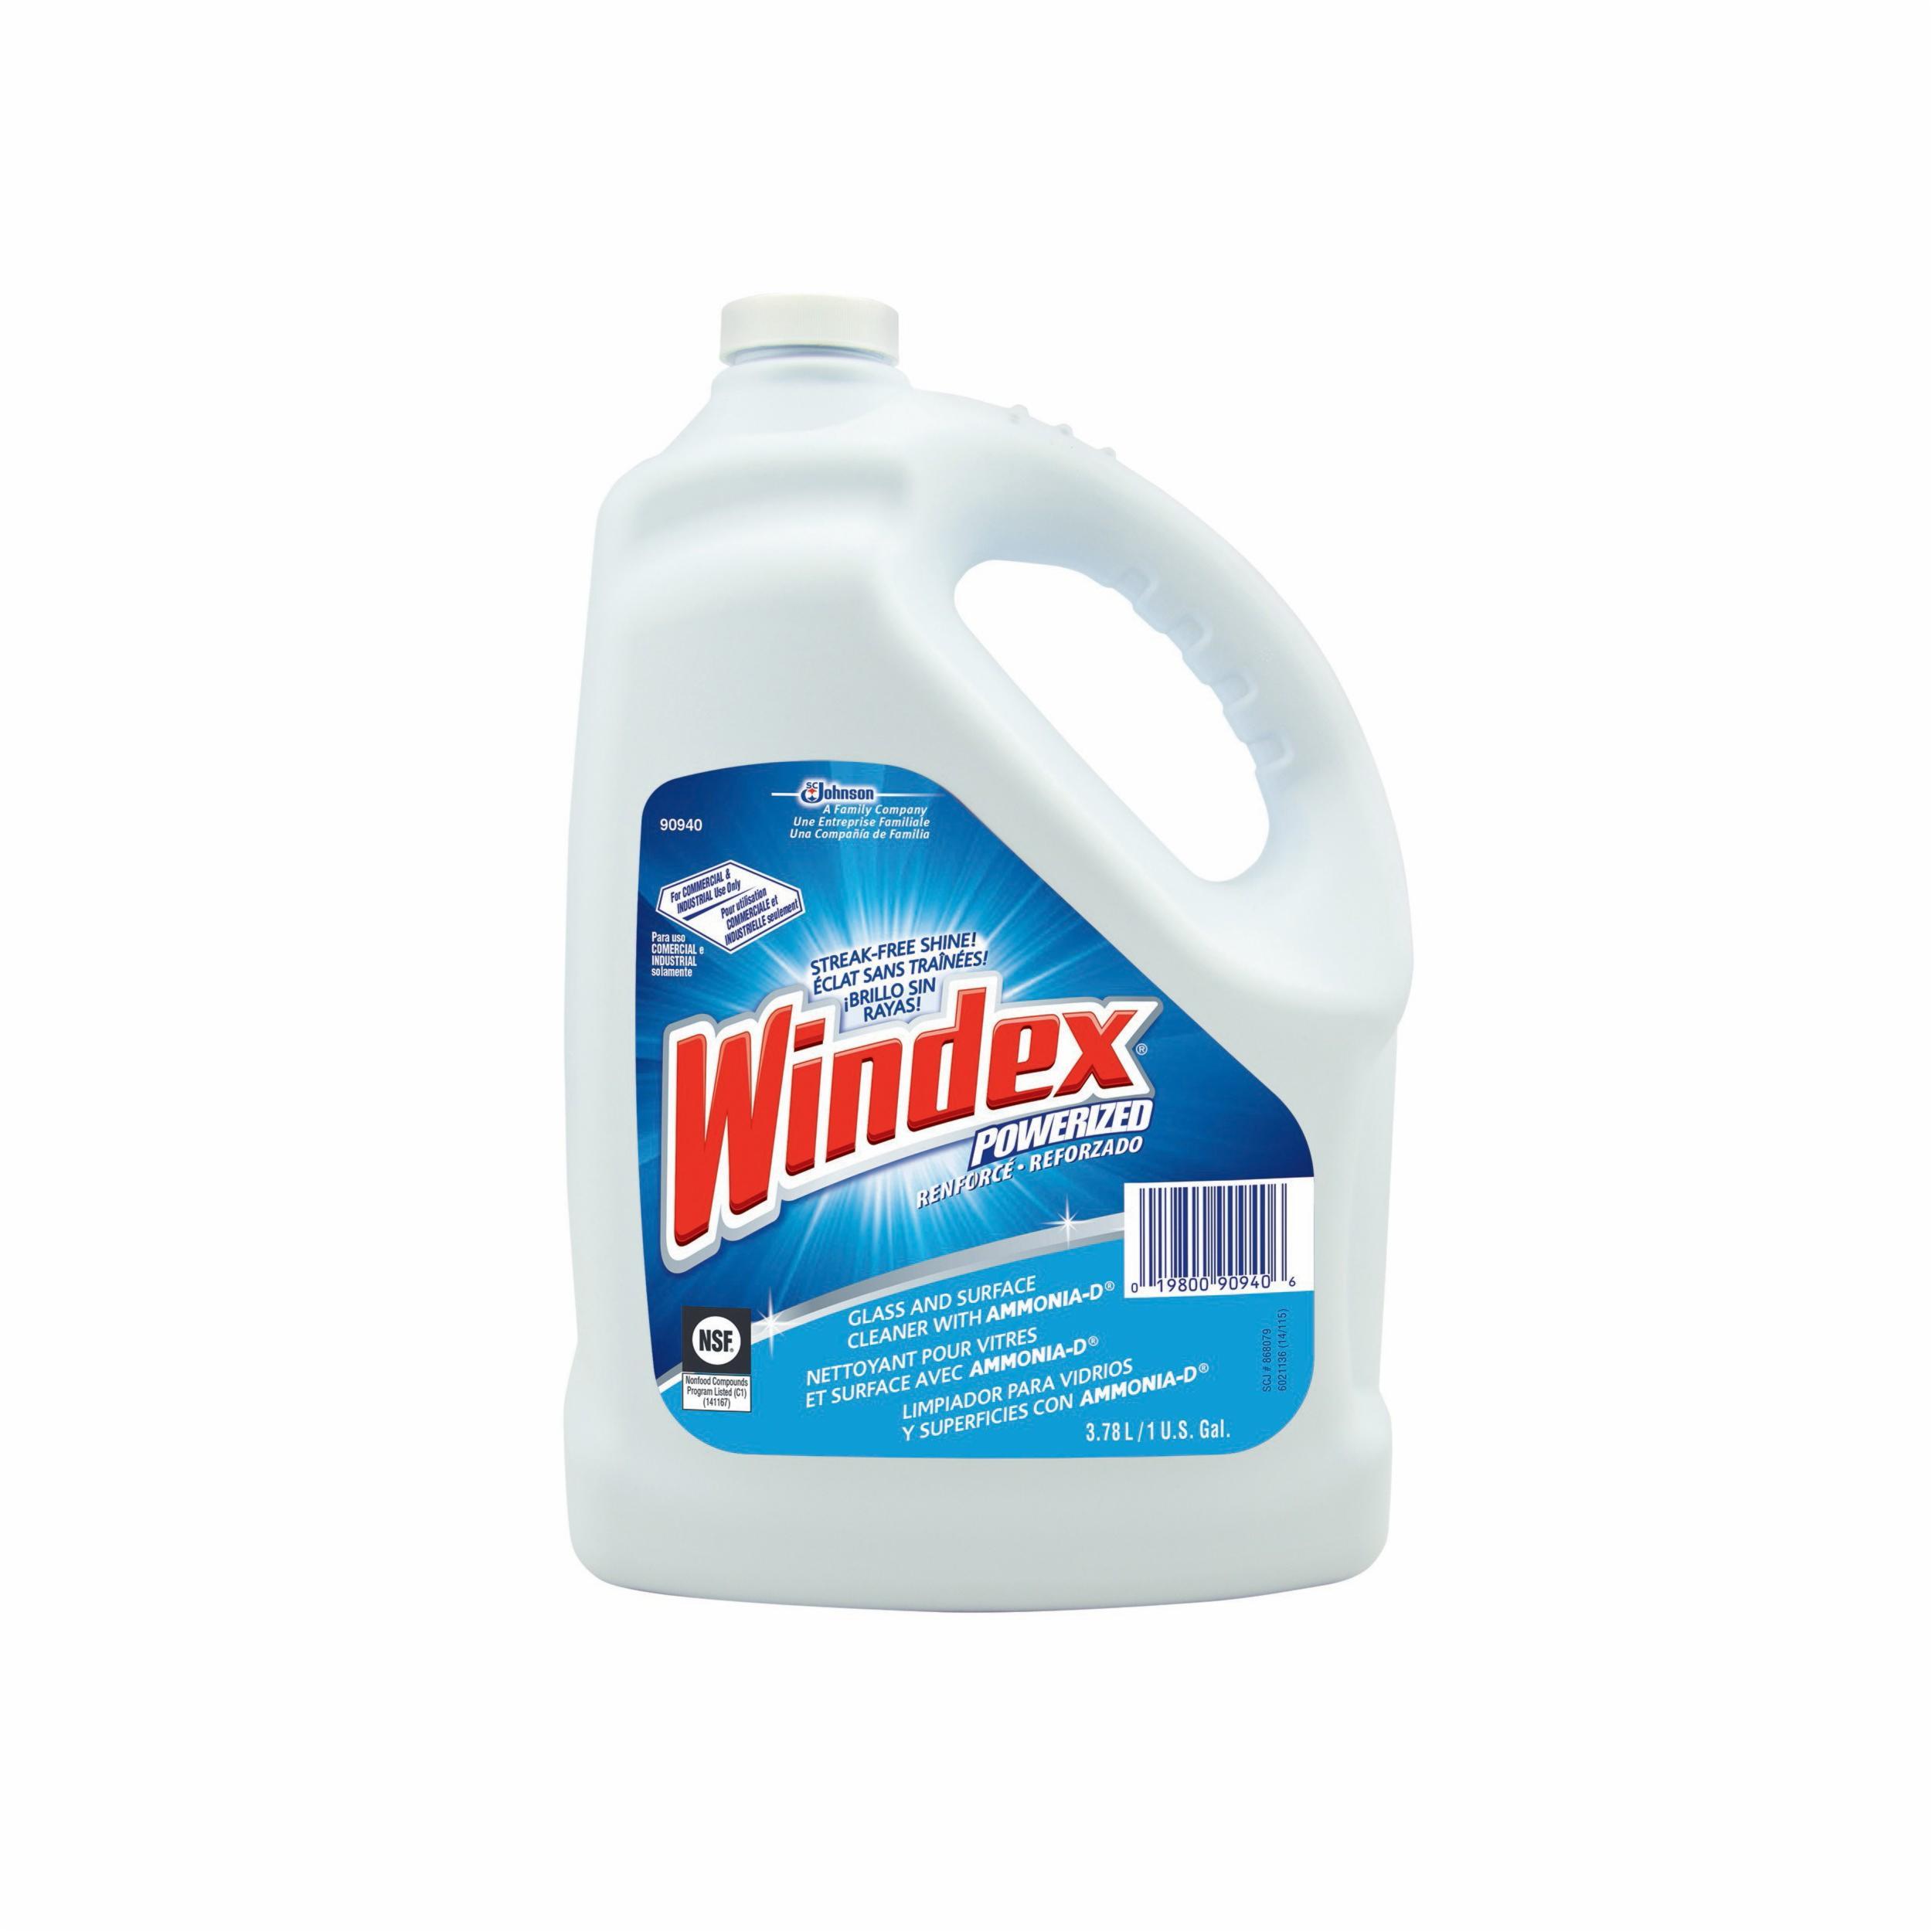 Windex® by Sealed Air 90940 Powerized RTU Glass Cleaner With Ammonia-D® -  1 gal Jug -  Liquid -  Clear Blue -  Ammonia